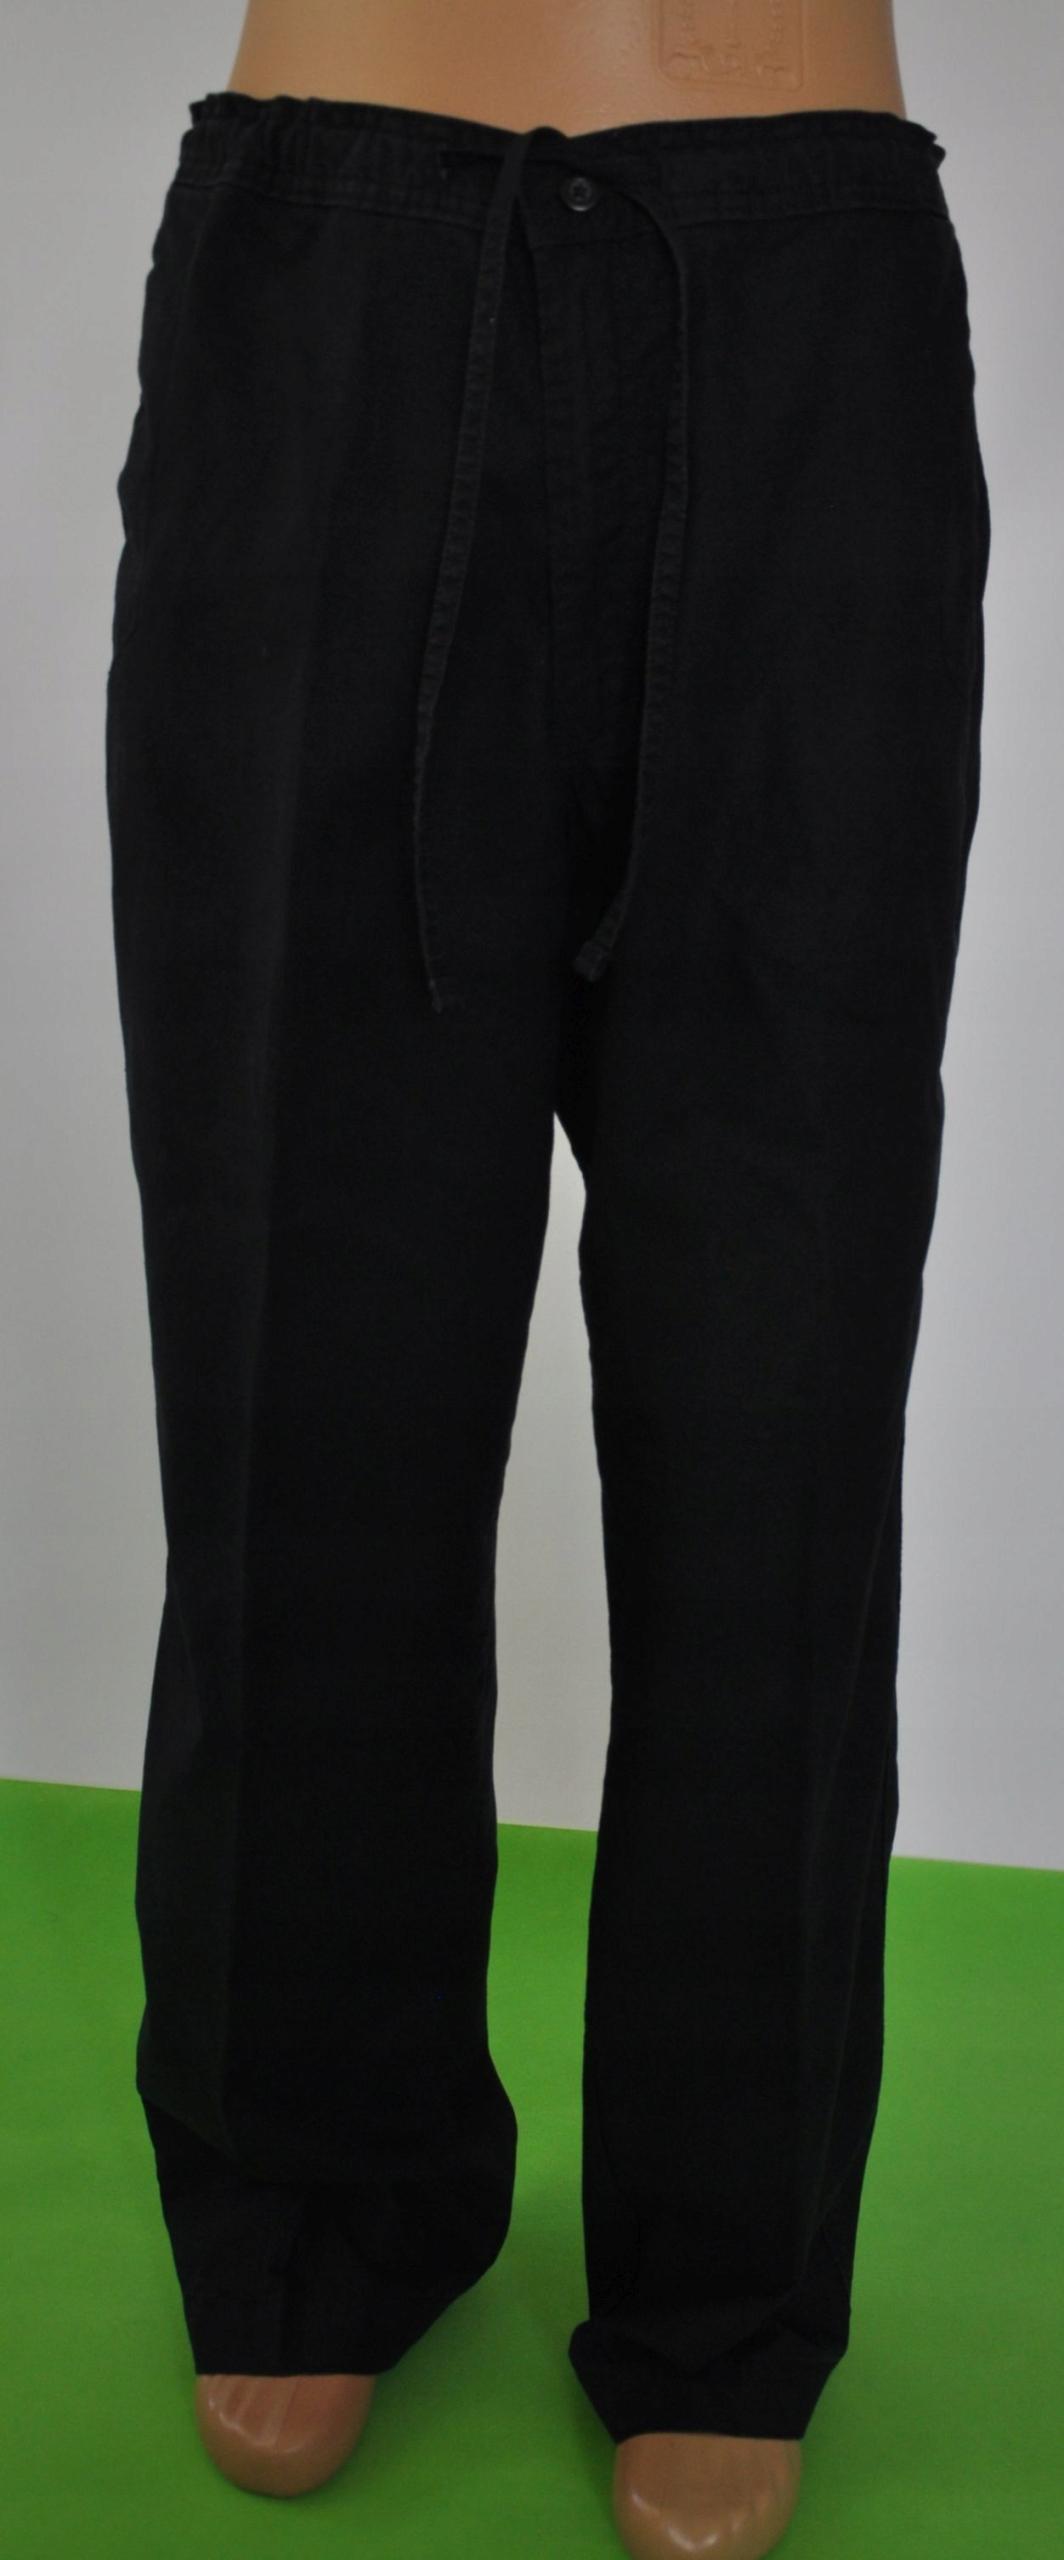 BLUE HARBOUR spodnie lniane czarne 36/33pas 96 cm